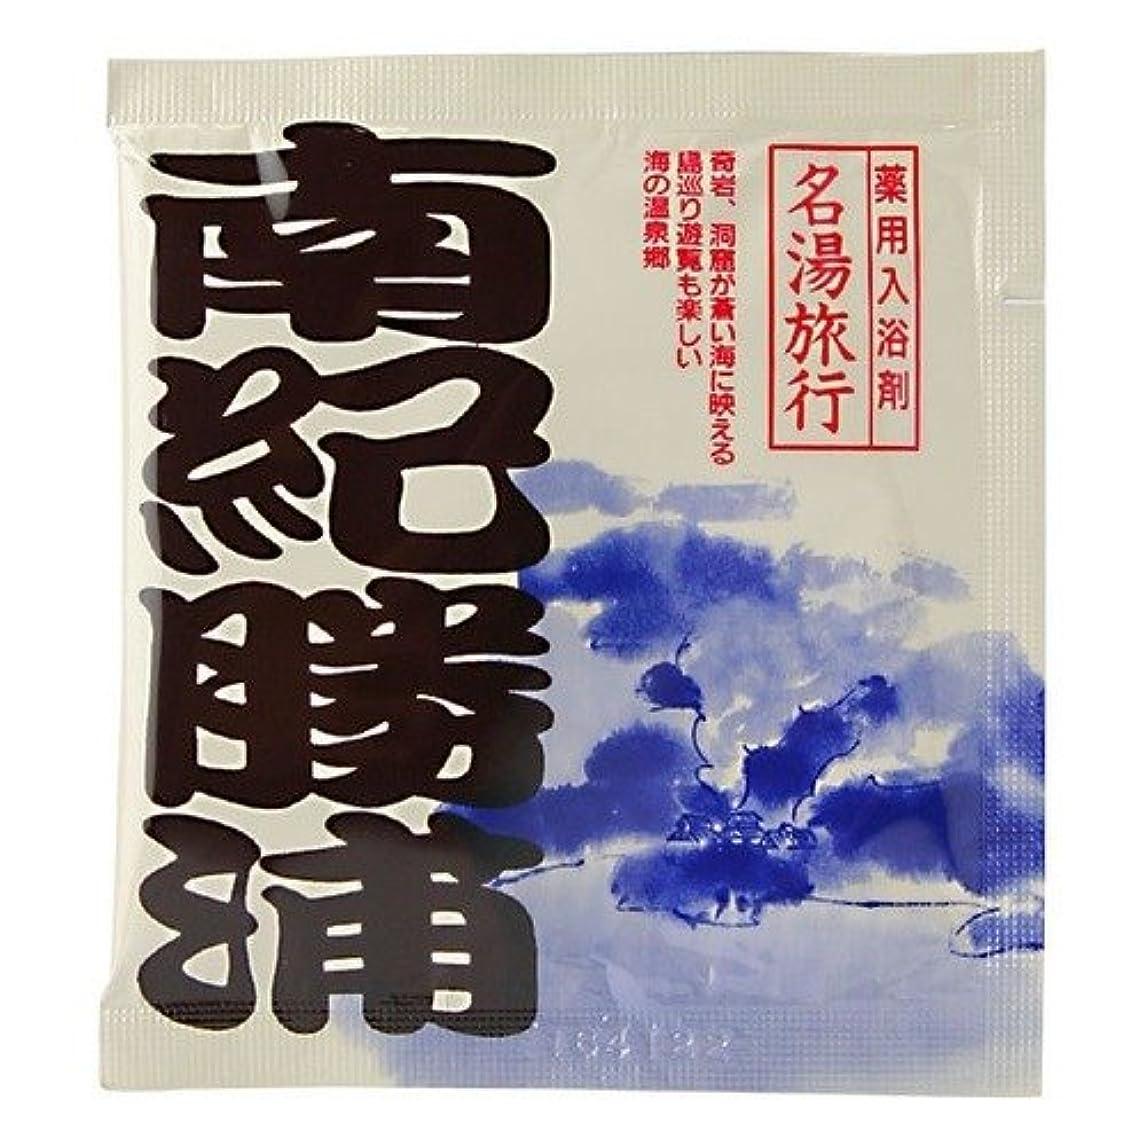 レザー急行する食器棚五洲薬品 名湯旅行 南紀勝浦 25g 4987332126737